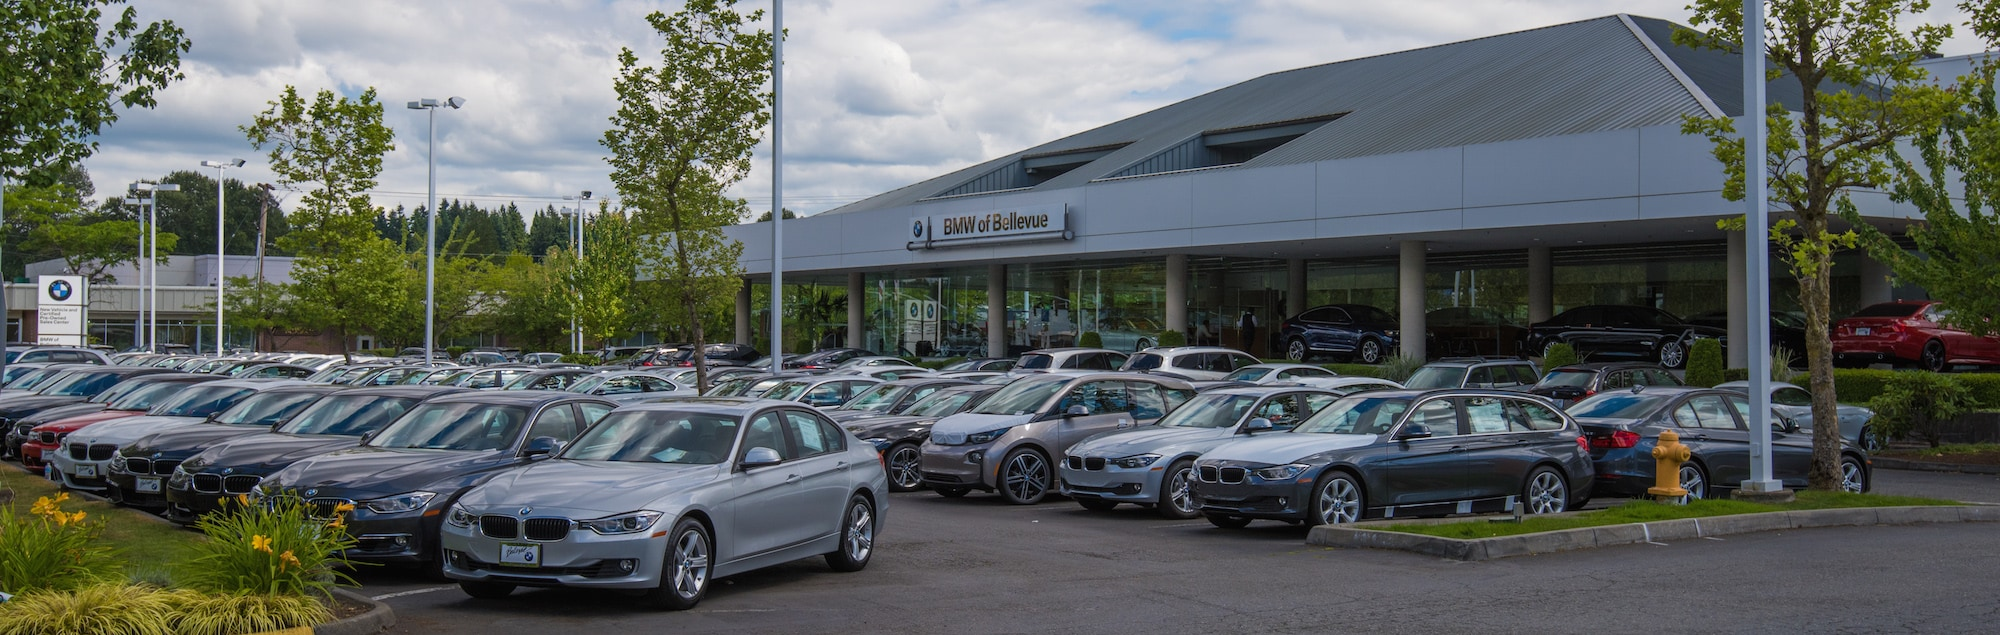 About AutoNation BMW of Bellevue WA  AutoNation BMW of Bellevue